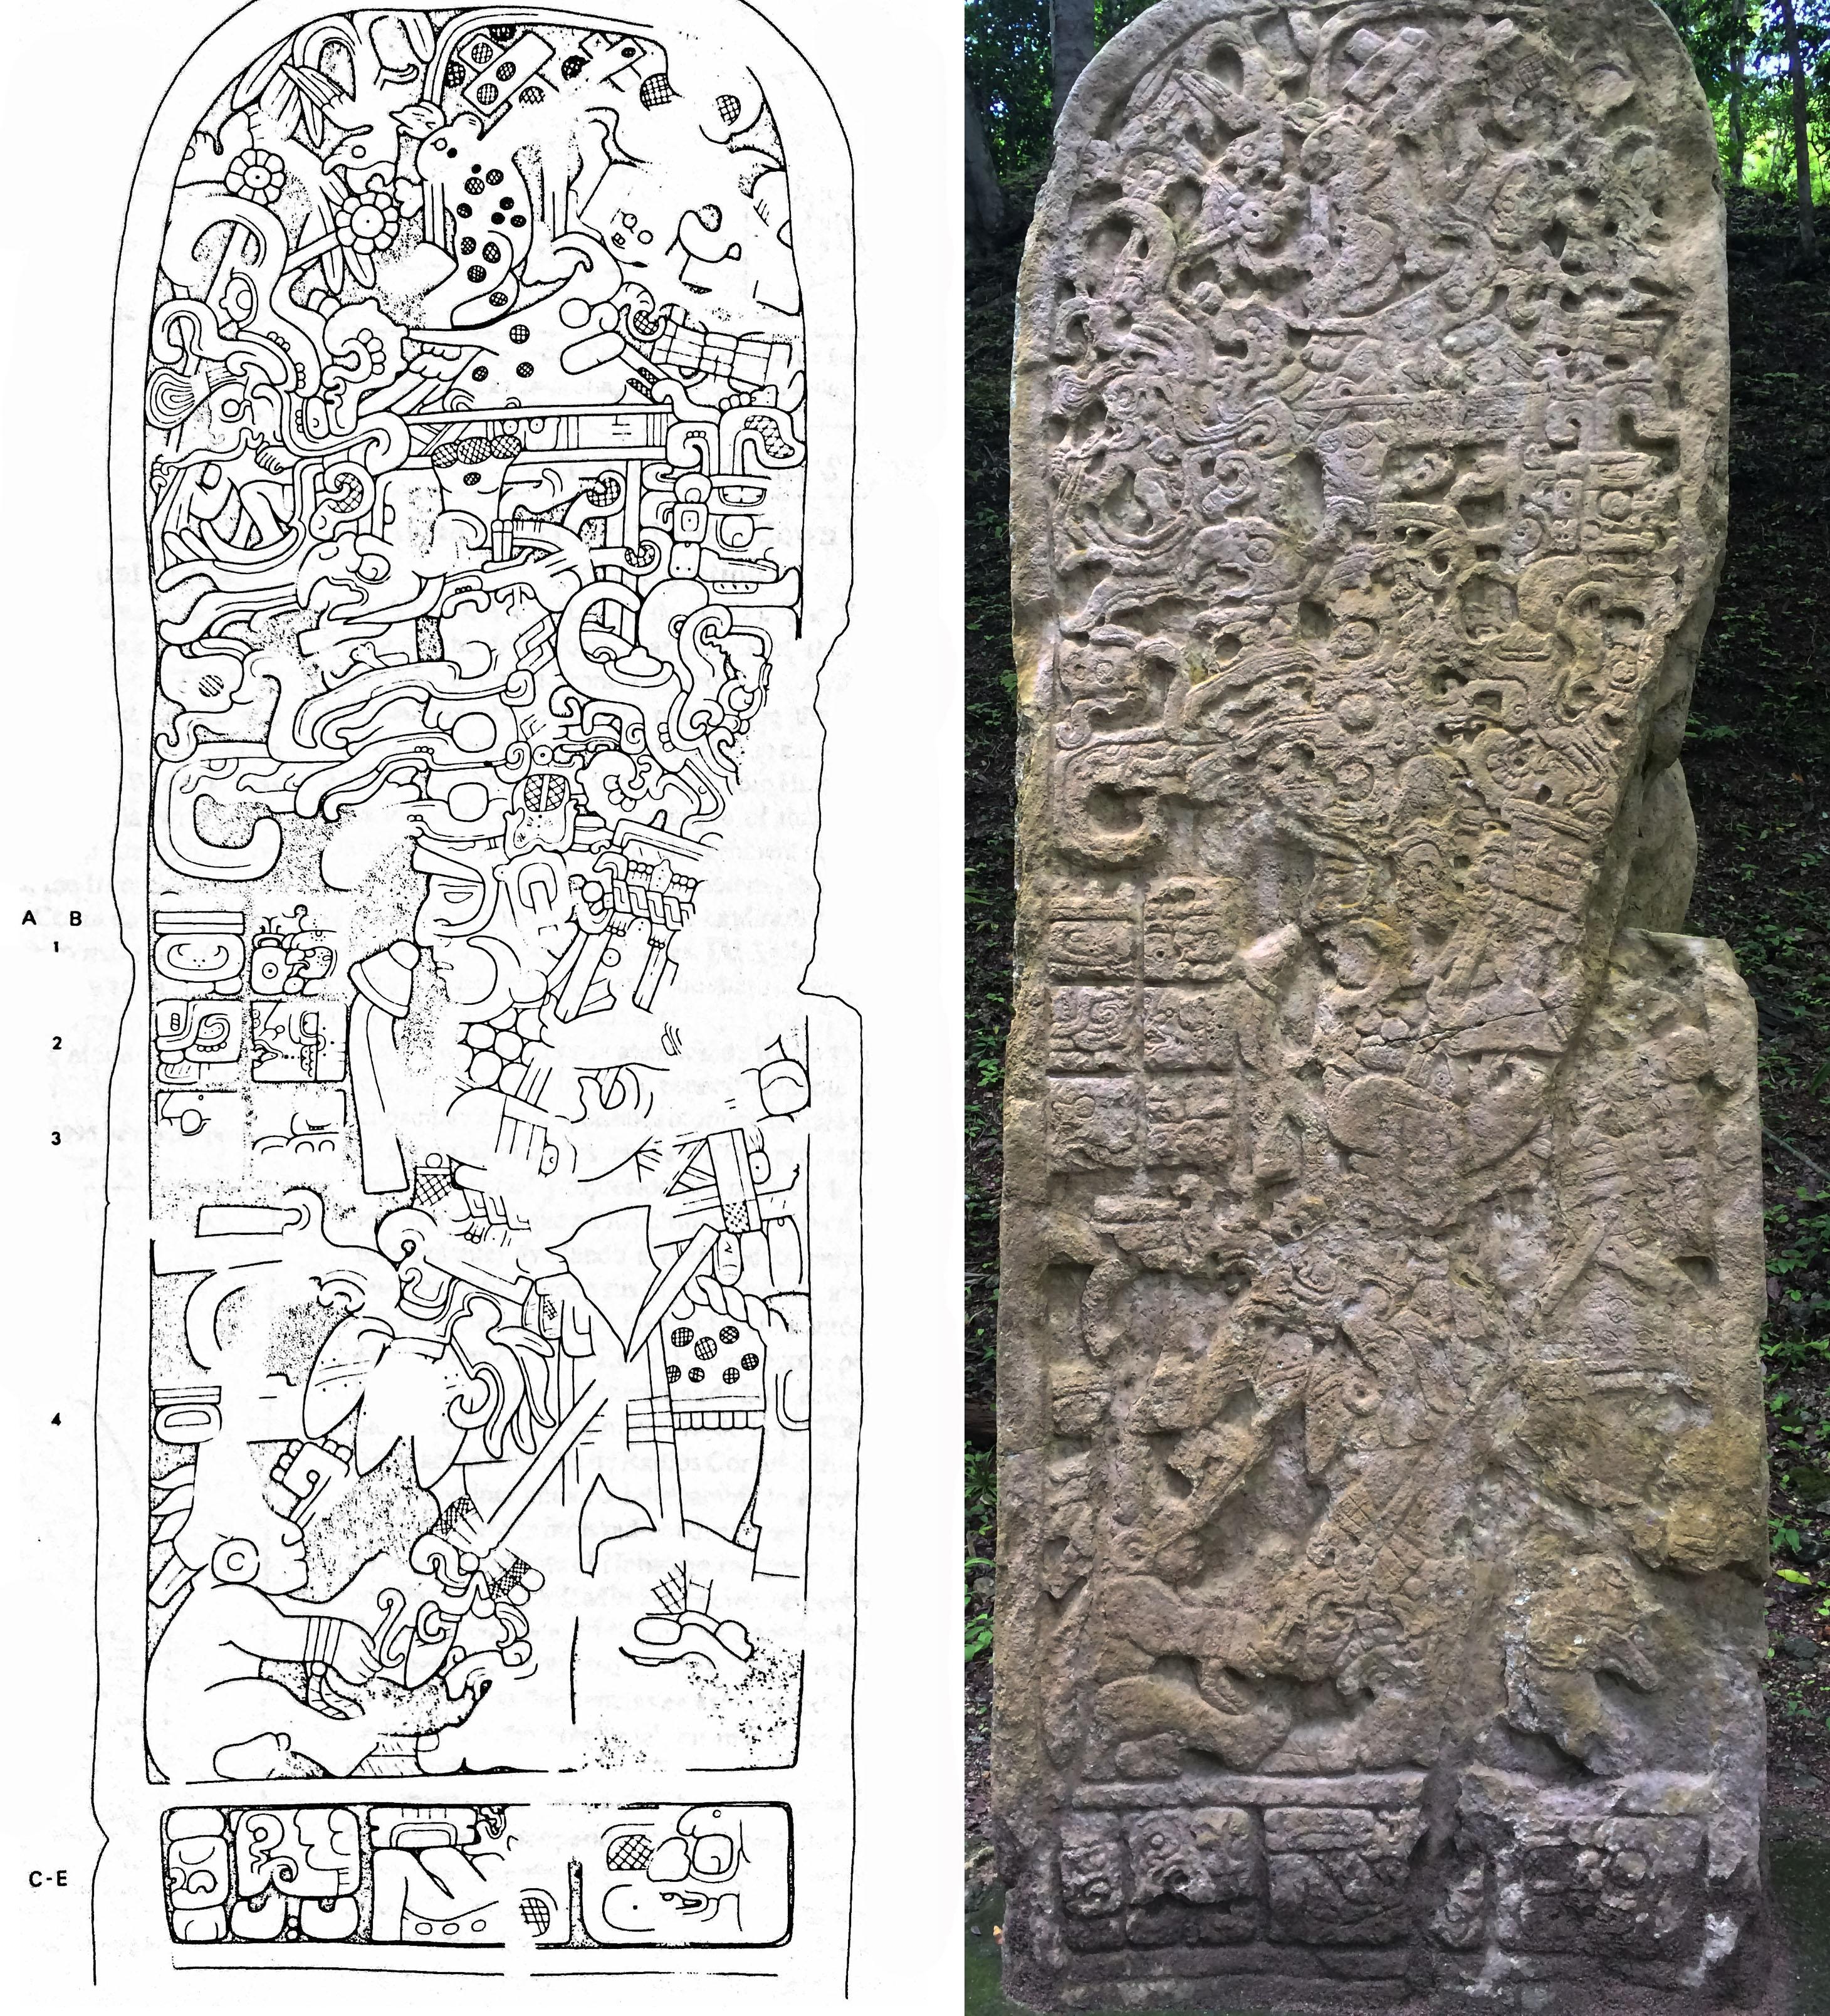 Maya Decipherment | Ideas on Ancient Maya Writing and Iconography